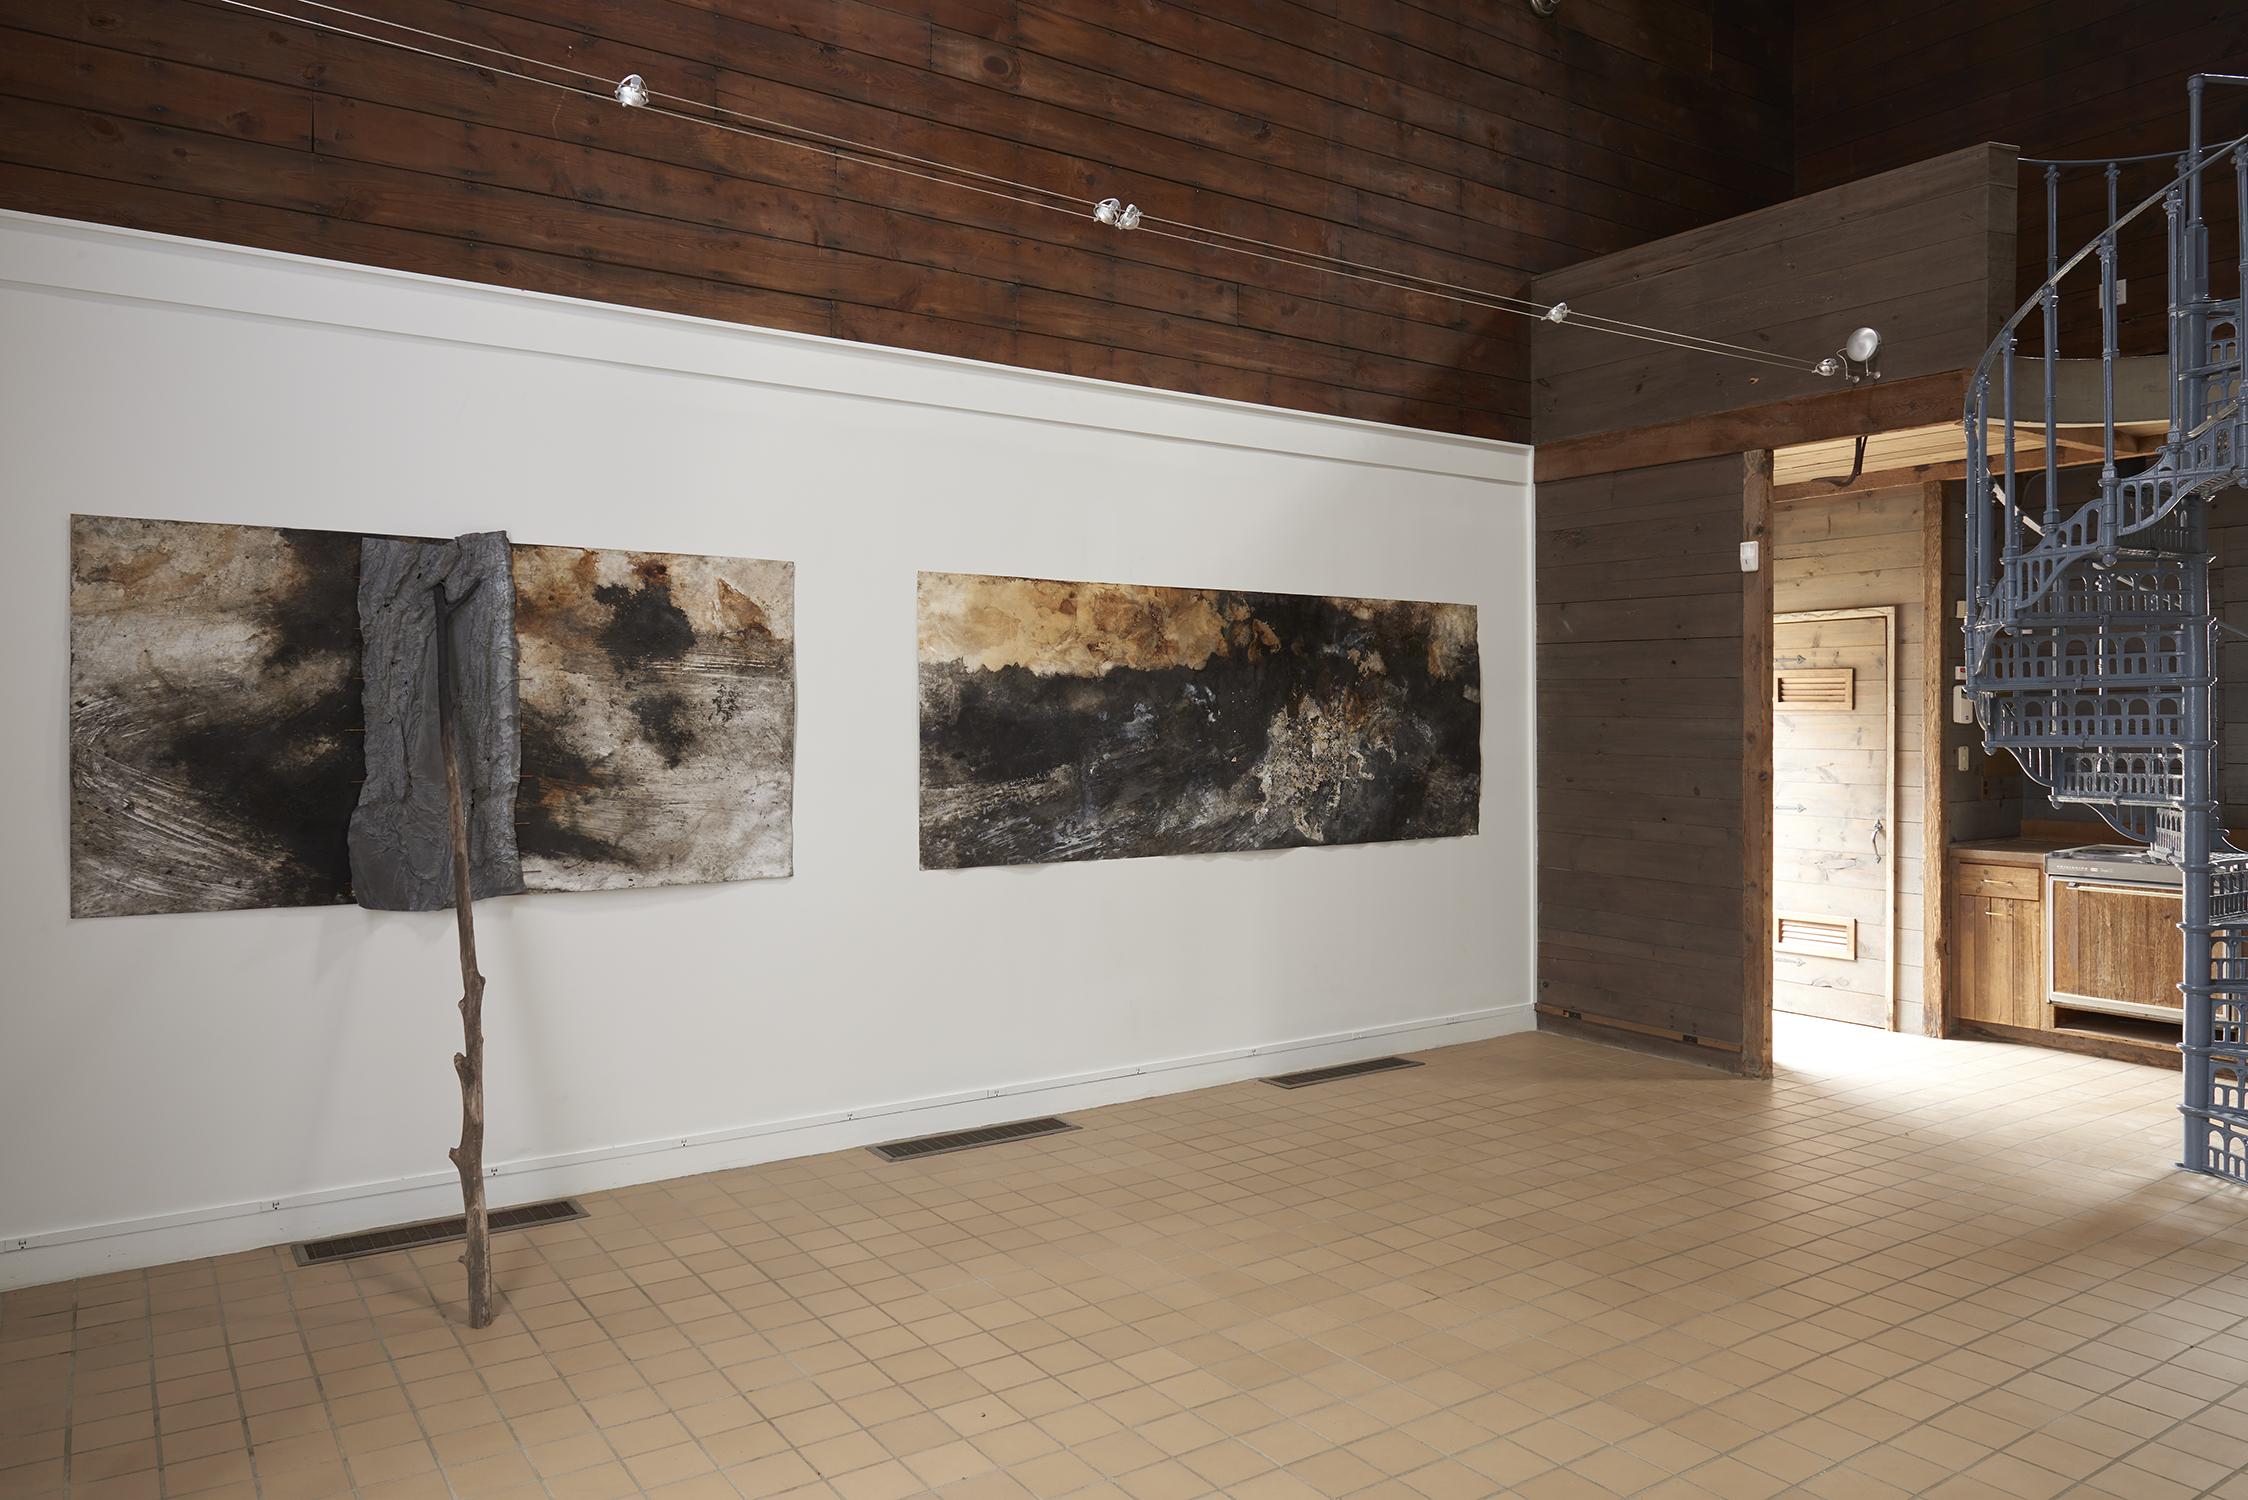 Athena LaTocha, installation view, JDJ   The Ice House, 2019